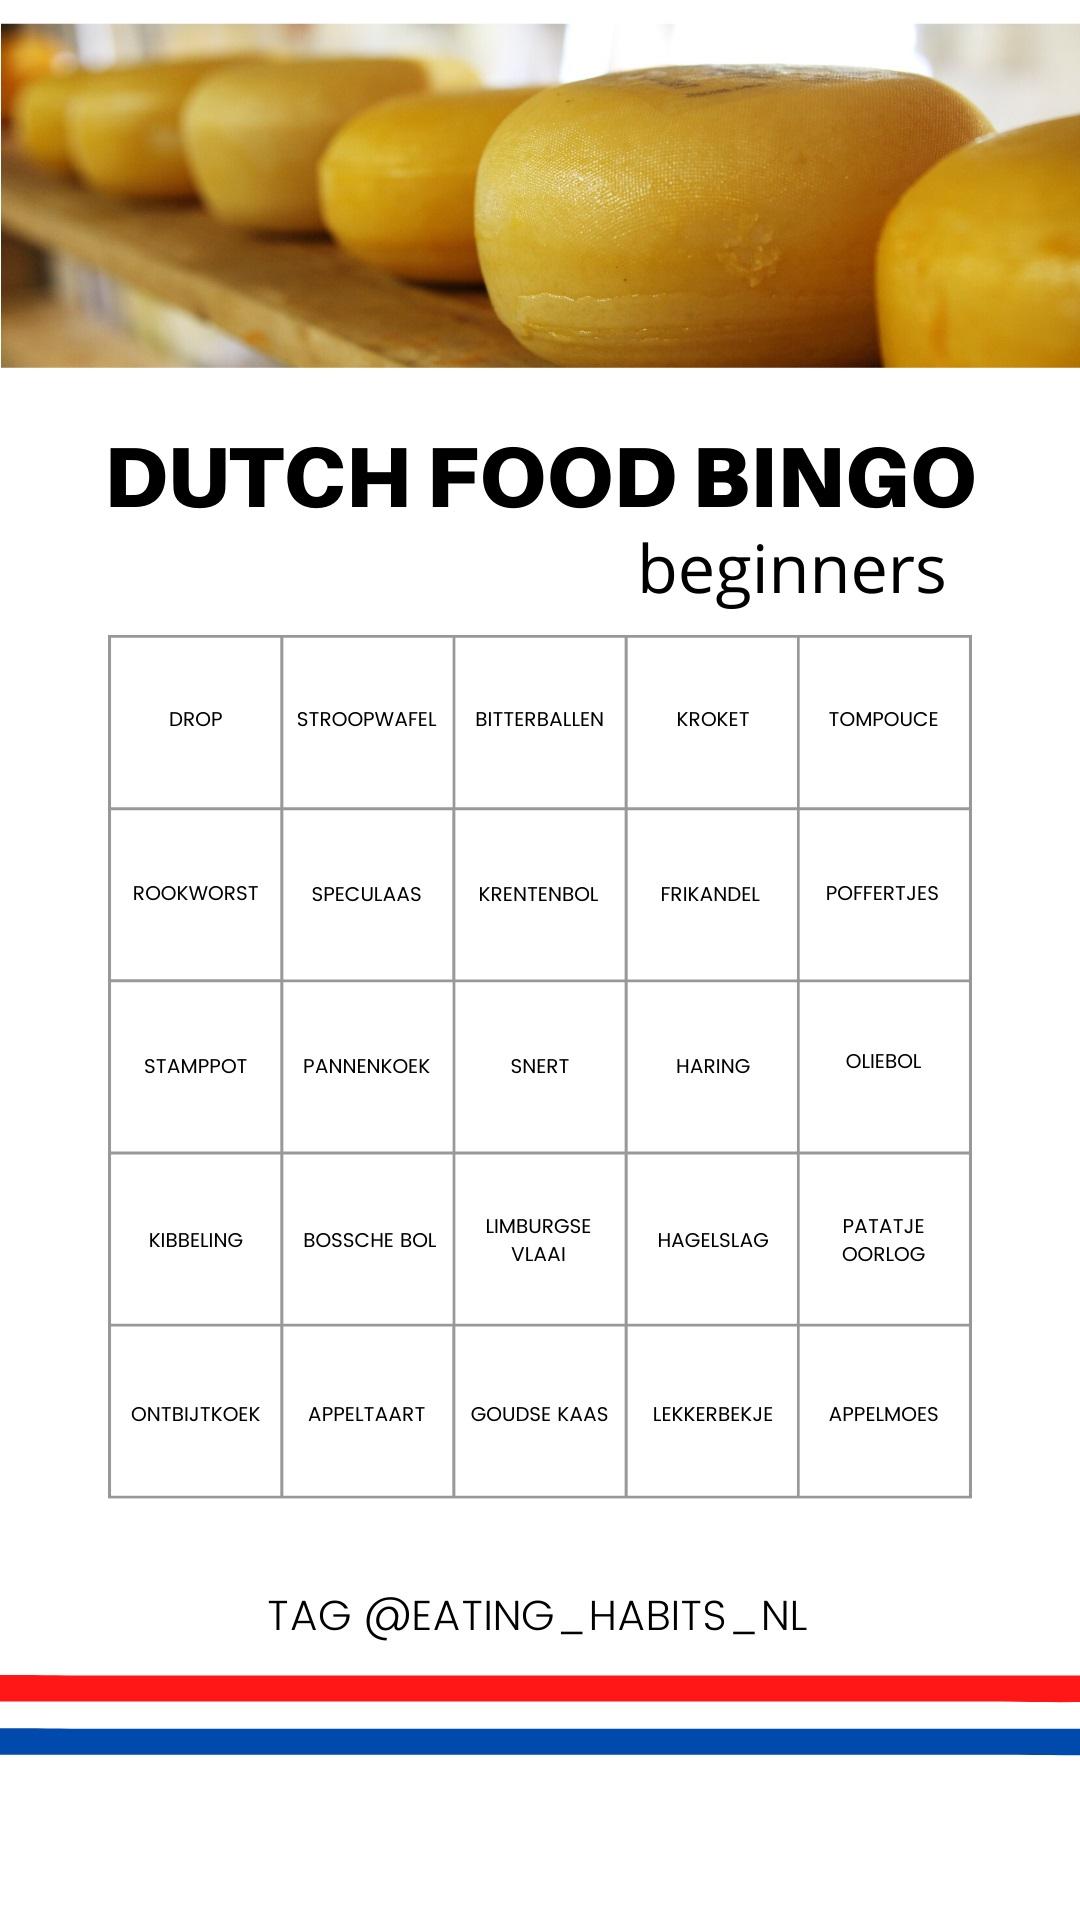 Dutch food bingo beginners - Eating Habits